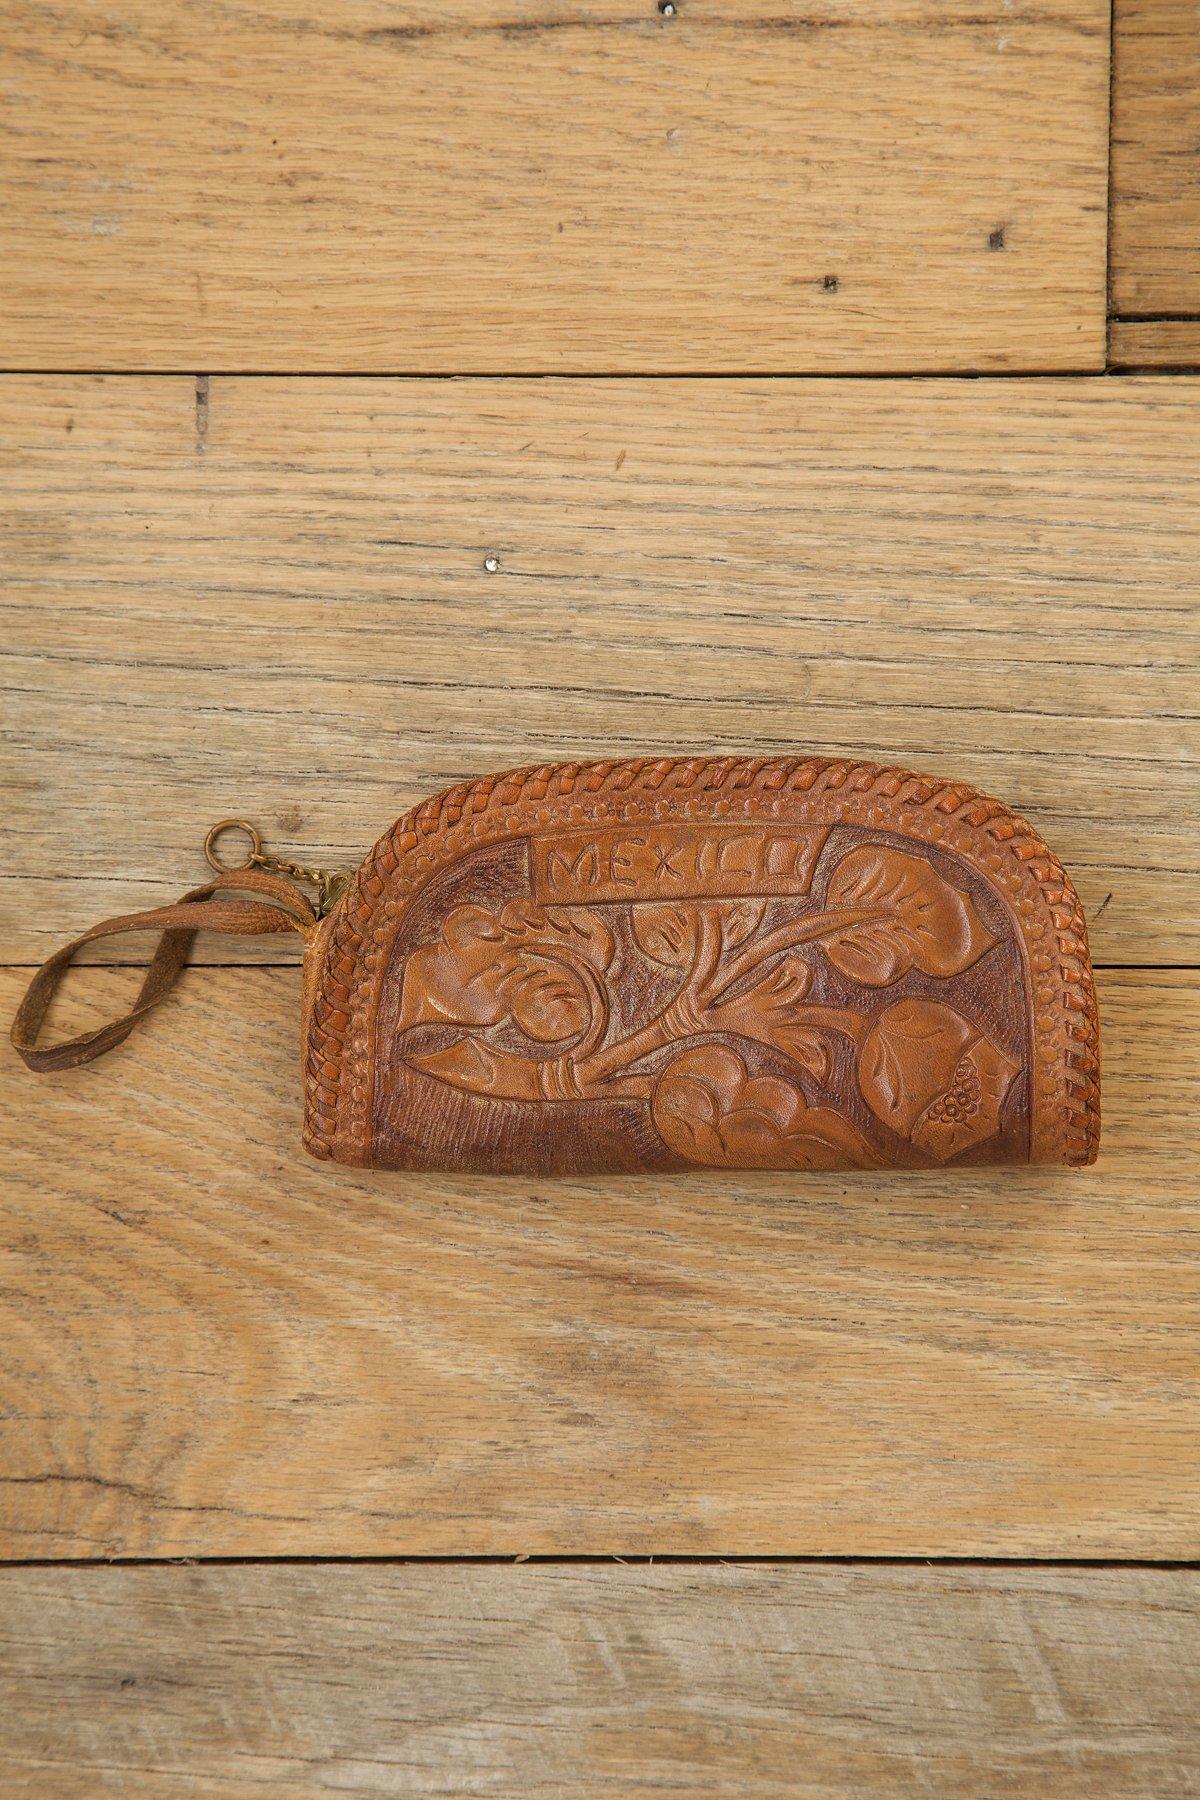 Vintage Tooled Leather Change Purse